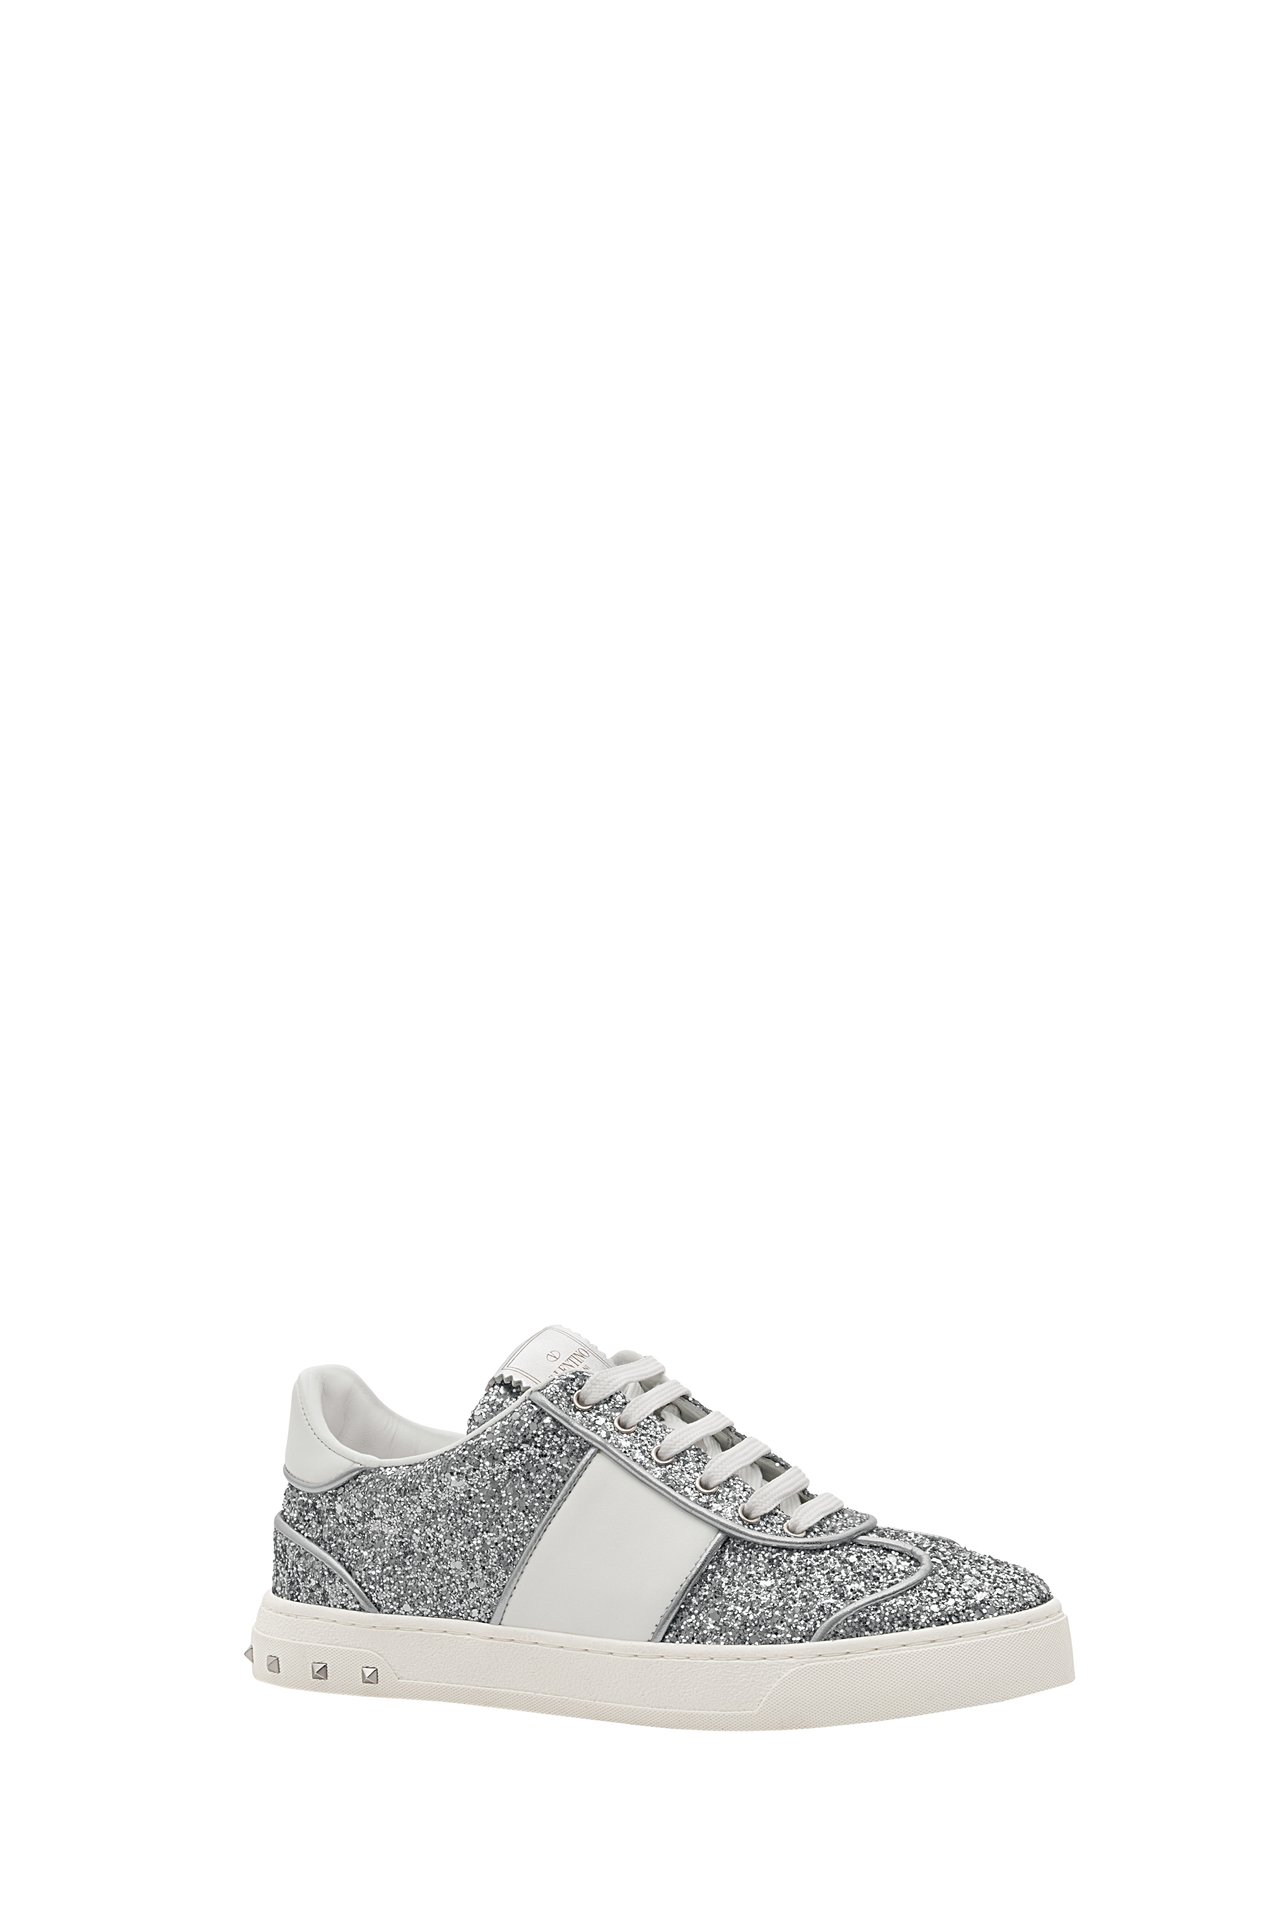 Valentino Garavani銀色亮粉運動鞋,22,400元。圖/Vale...